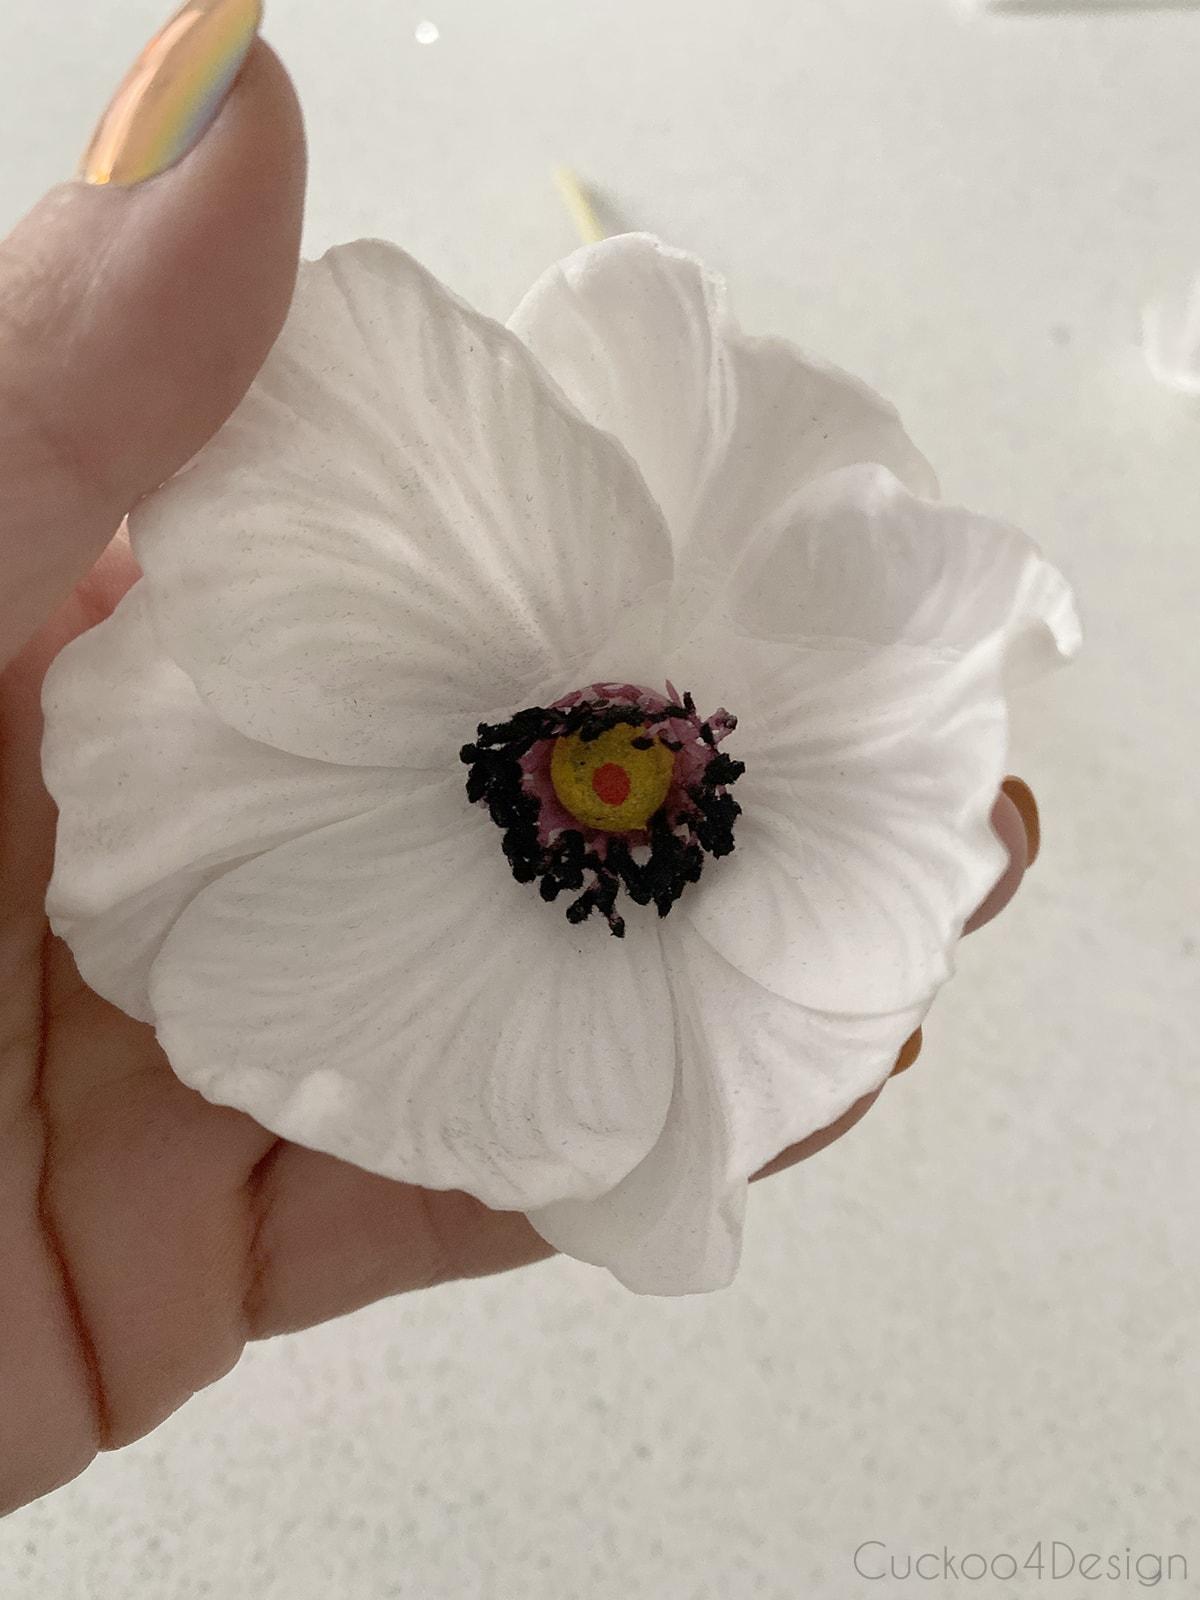 small white poppy flower with dark center